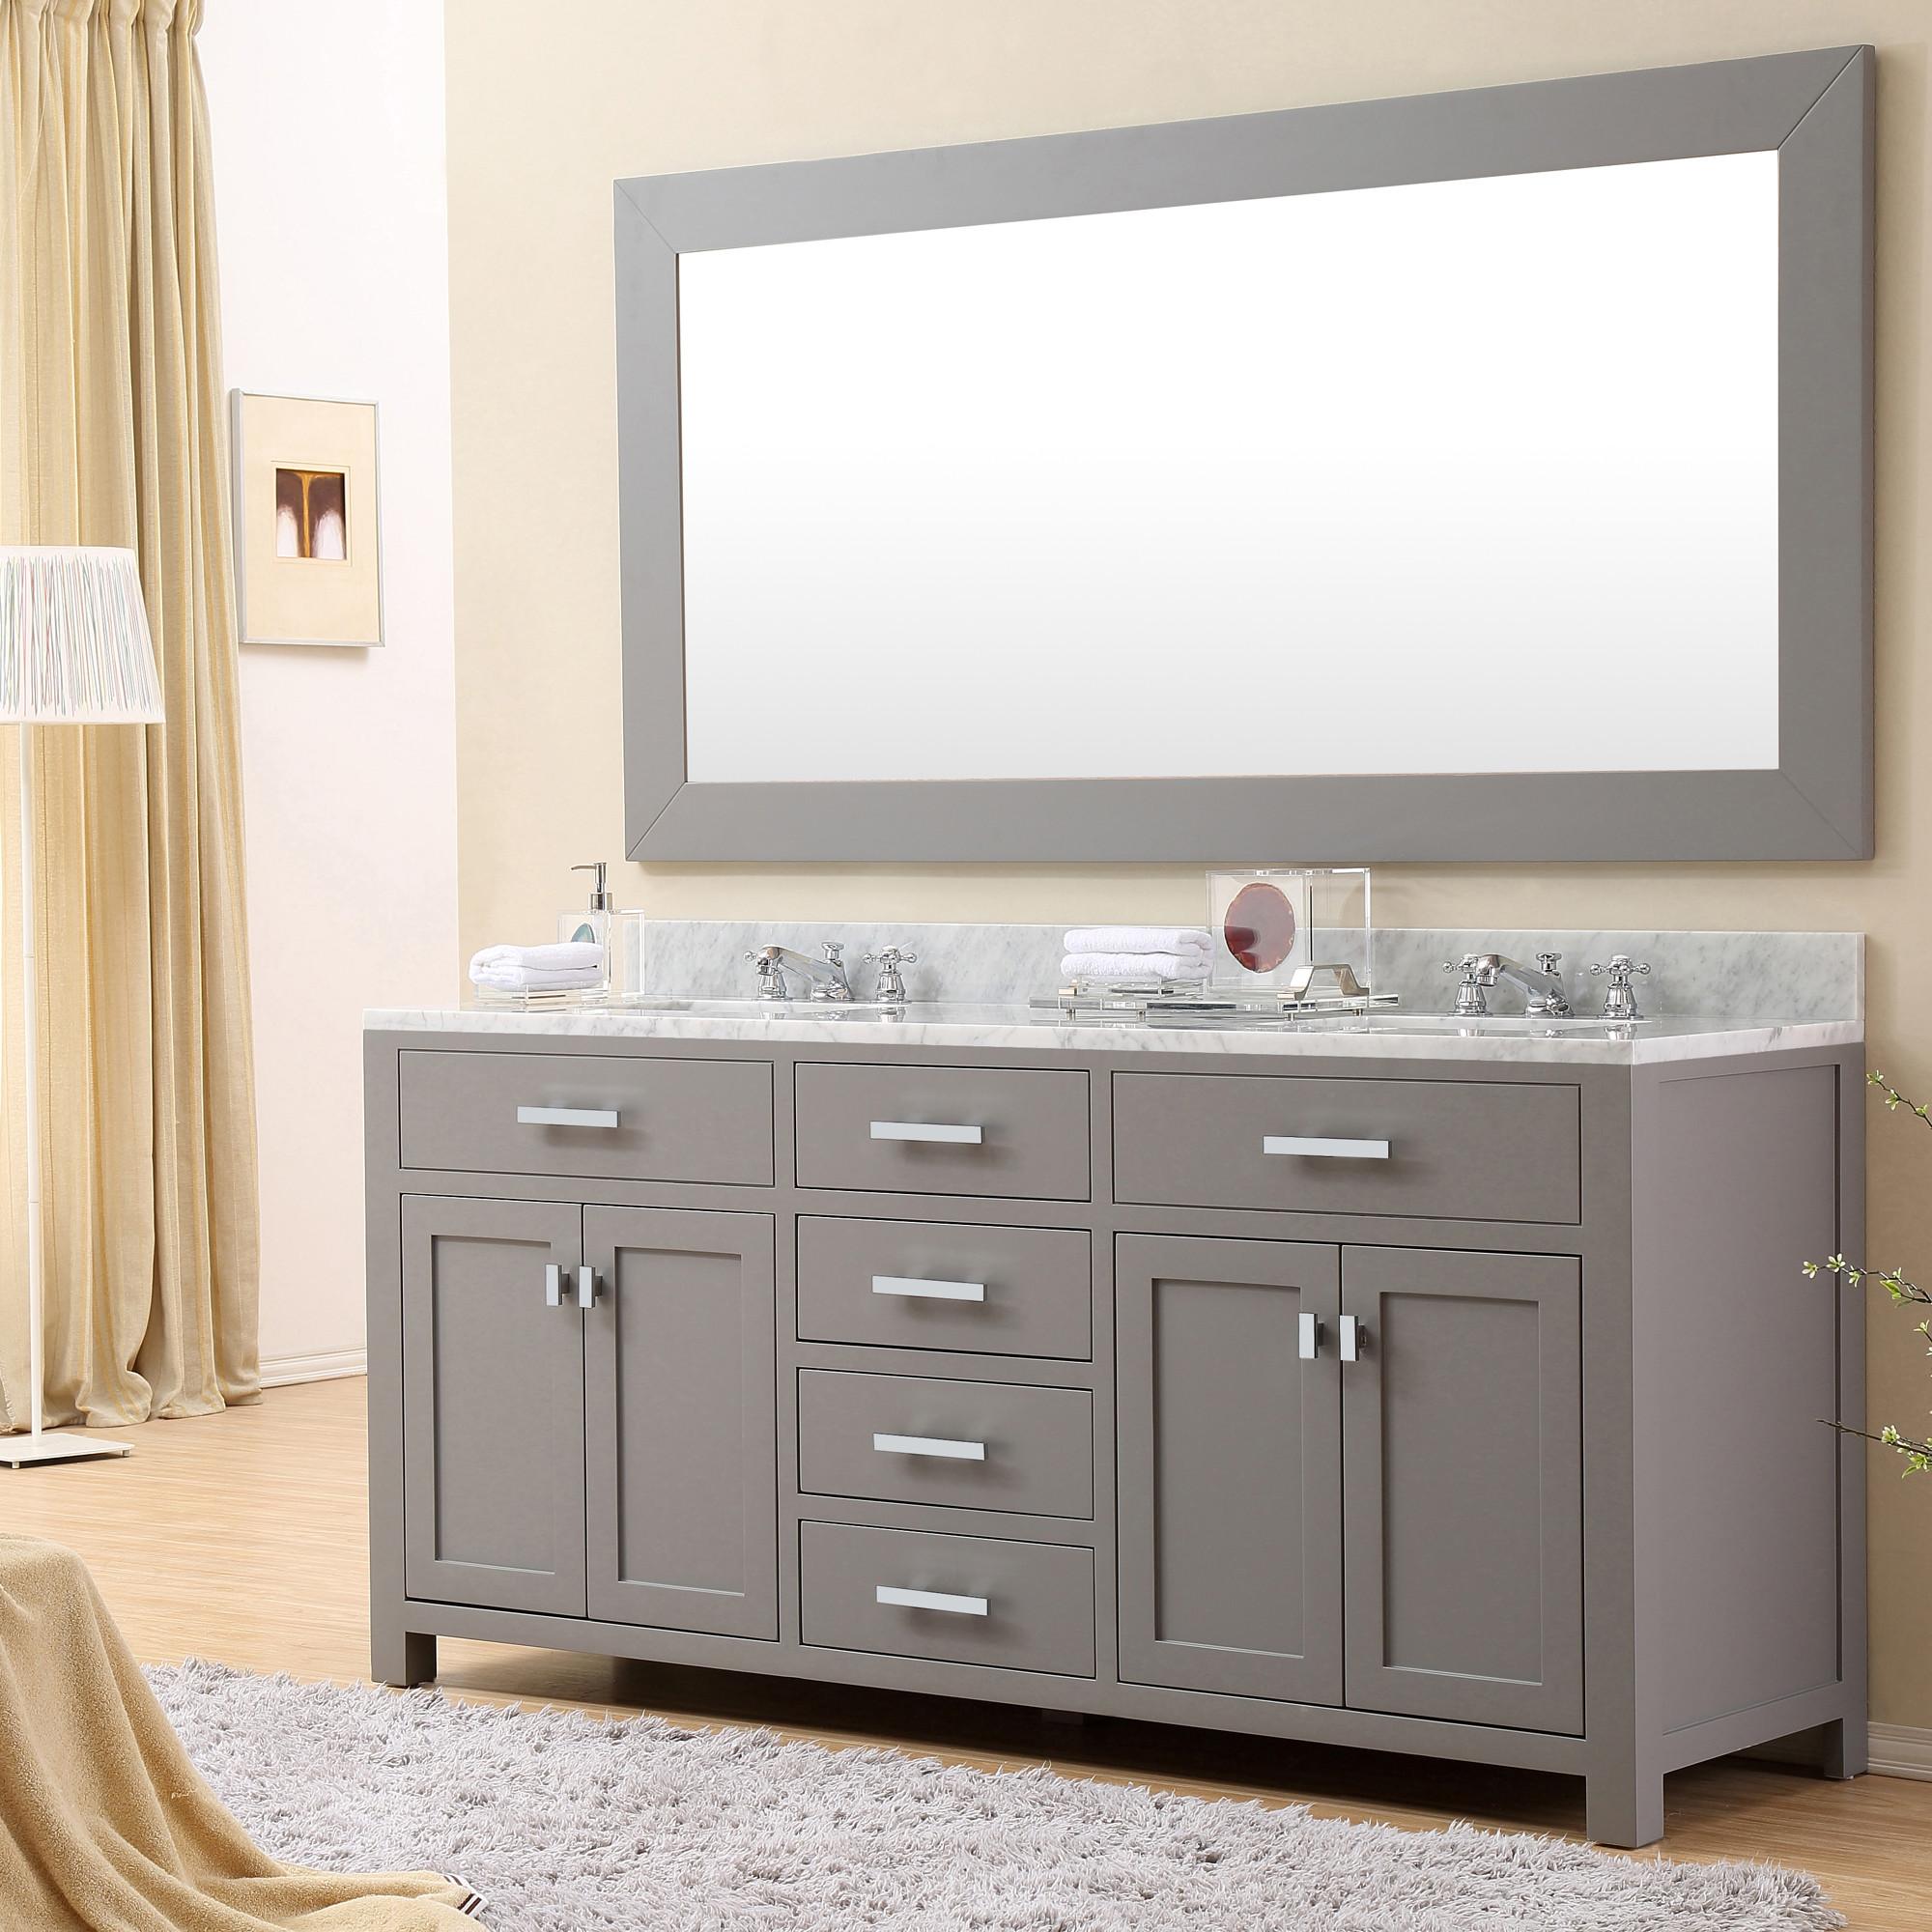 72 inch Gray Double Sink Bathroom Vanity Carrara White Marble Top